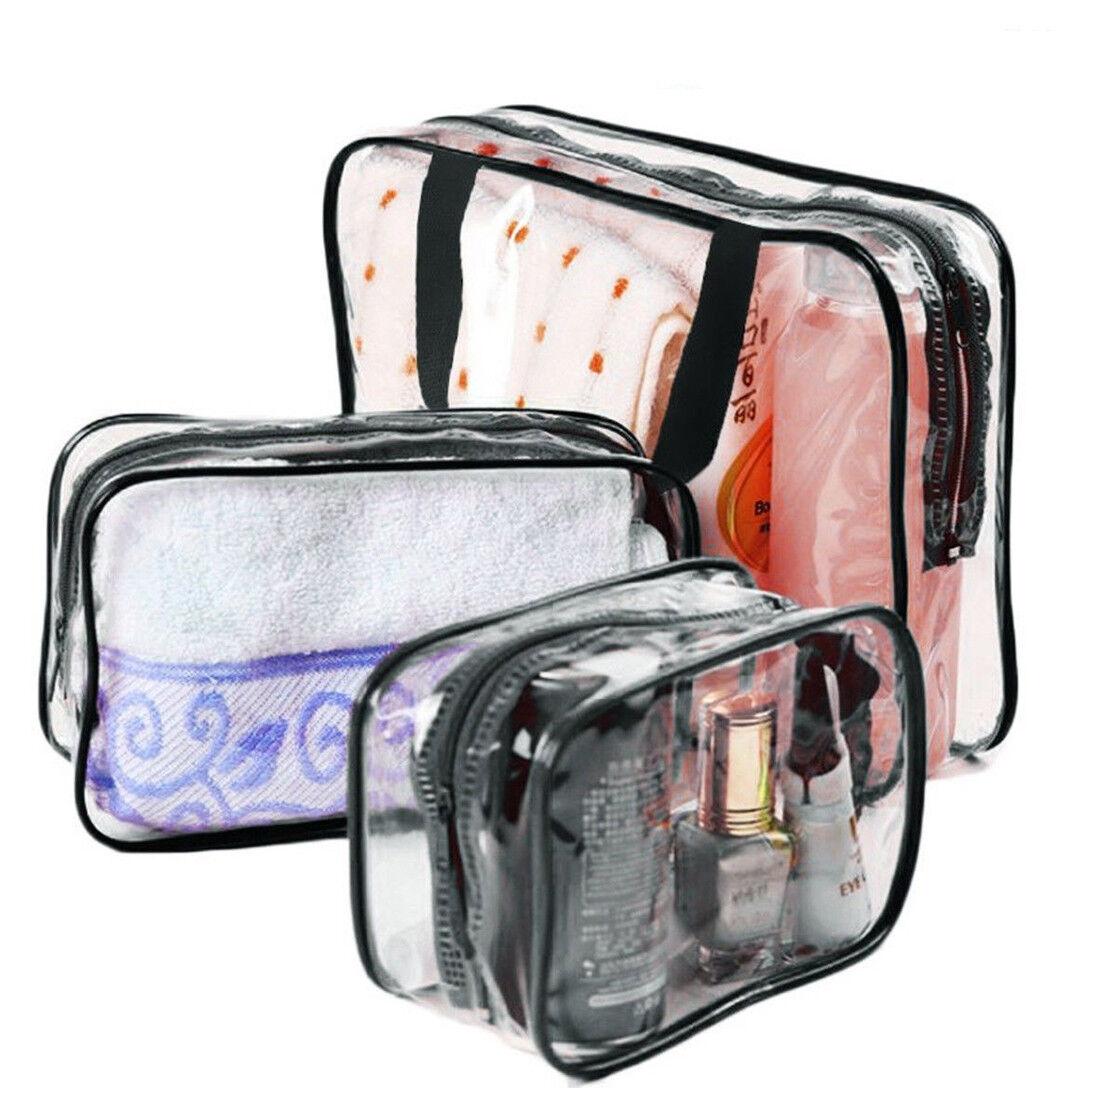 3 pcs clear pvc travel wash bag cosmetic makeup toiletry. Black Bedroom Furniture Sets. Home Design Ideas